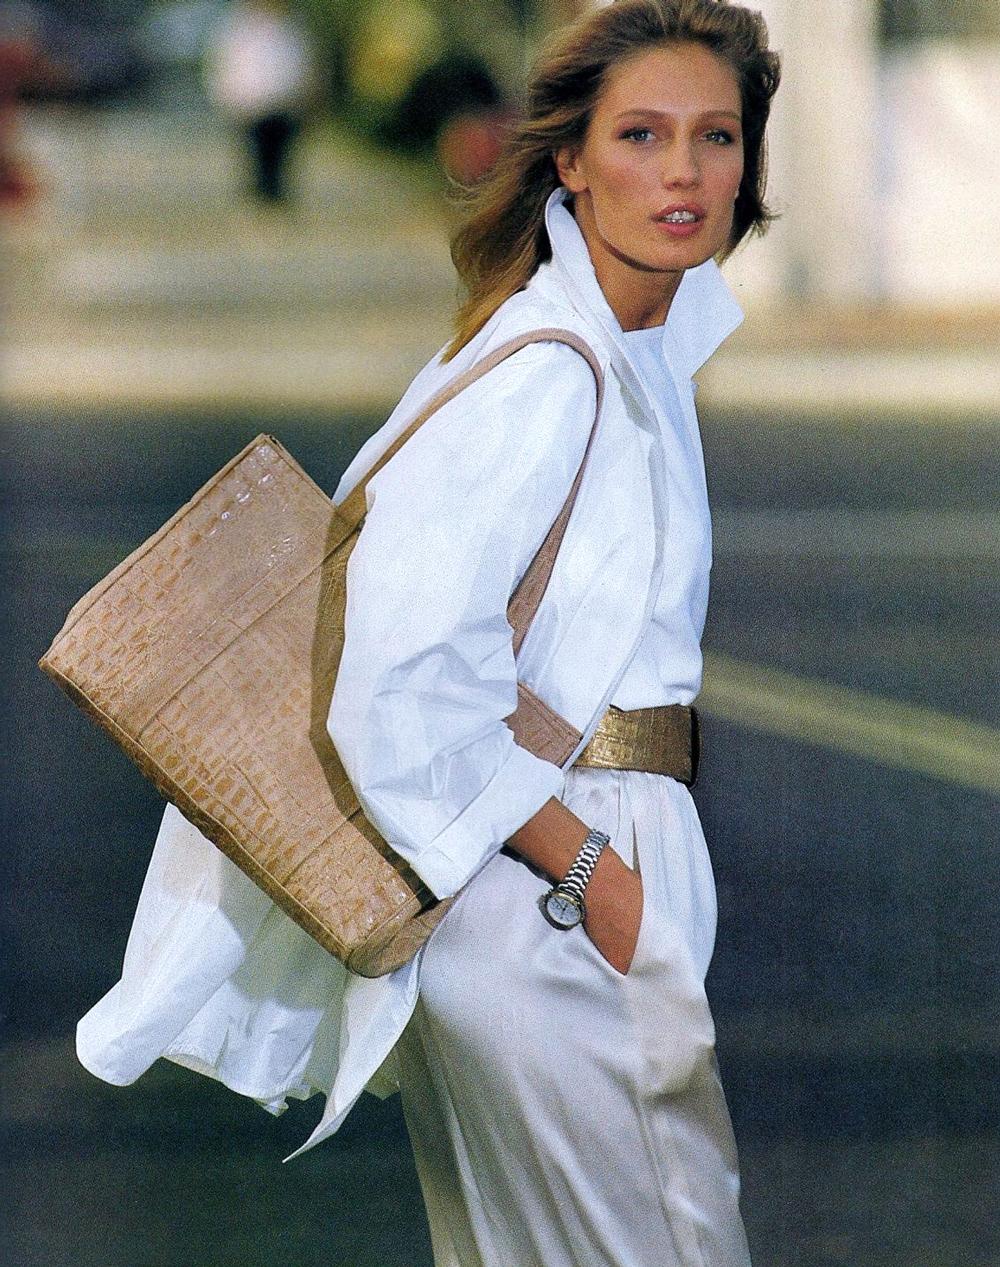 Elle France February 1987 / white shirt in fashion editorials / short history of white shirt / wardrobe essentials / via fashioned by love british fashion blog